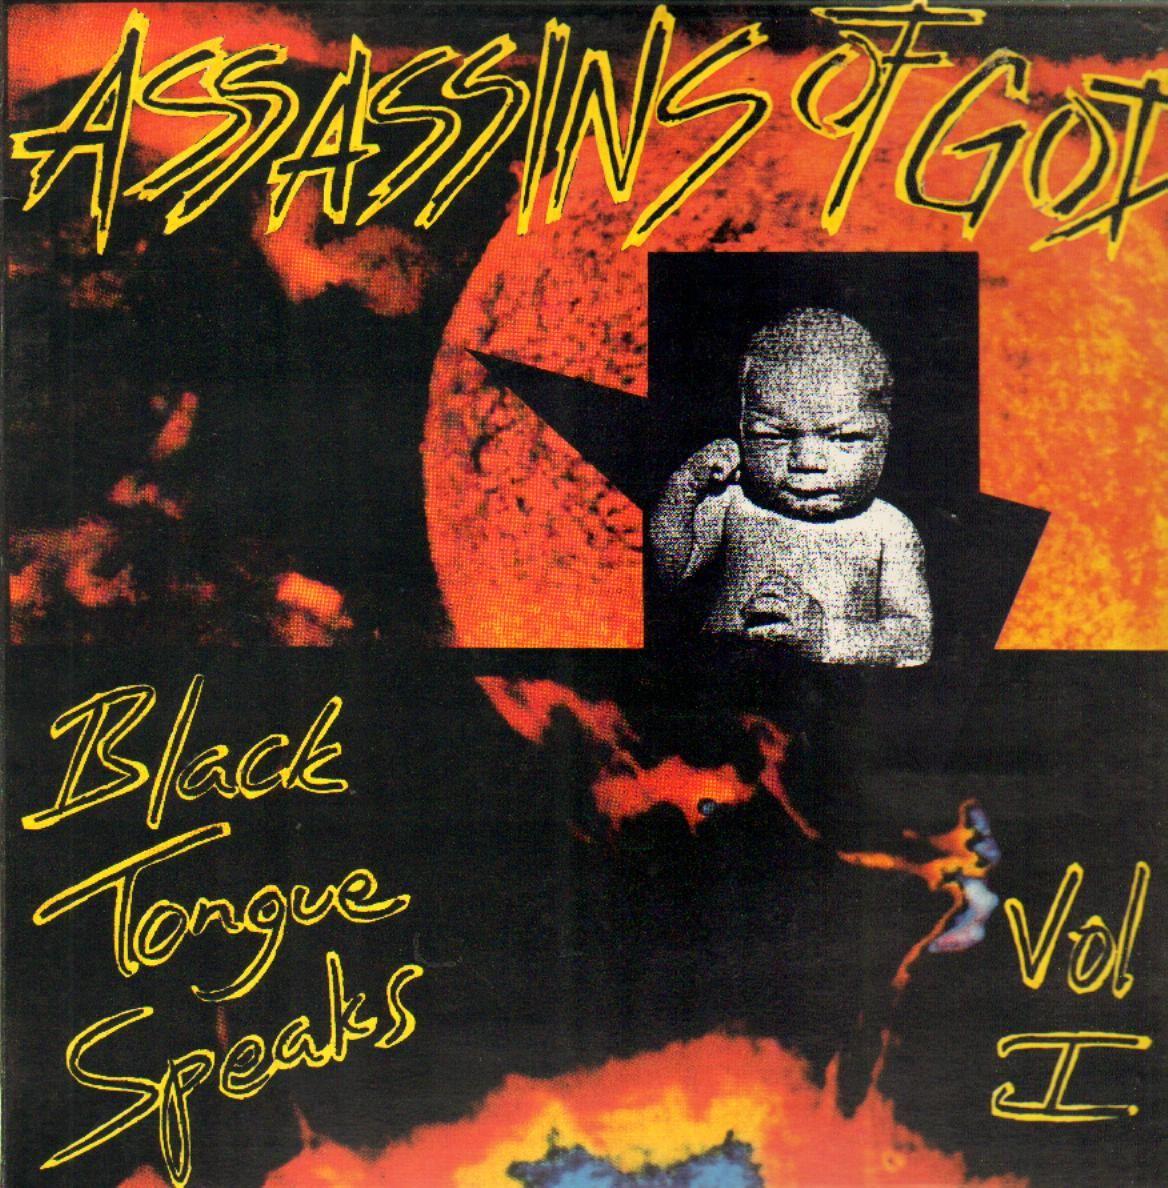 Assassins Of God - Black Tongue Speaks Vol I 1991